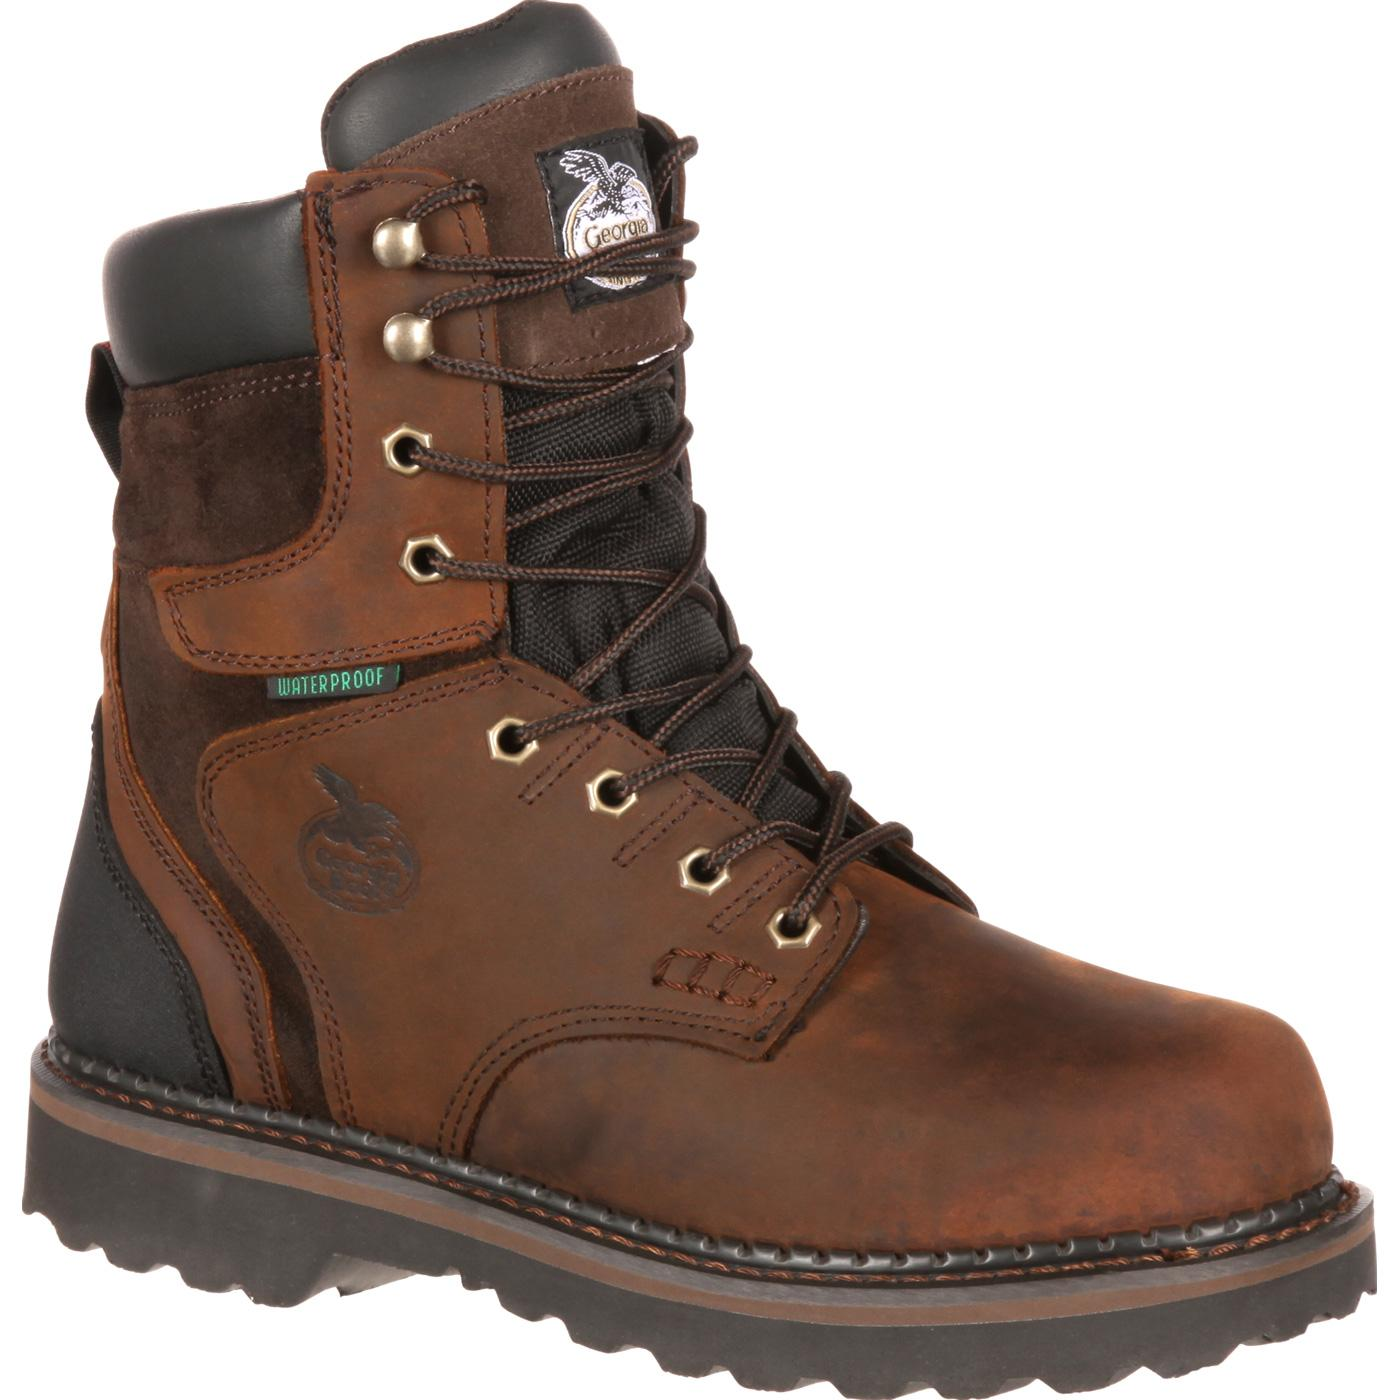 1eeba93ea08 Details about Georgia Boot Brookville Waterproof Work Boot Steel shank -  Solid stable work